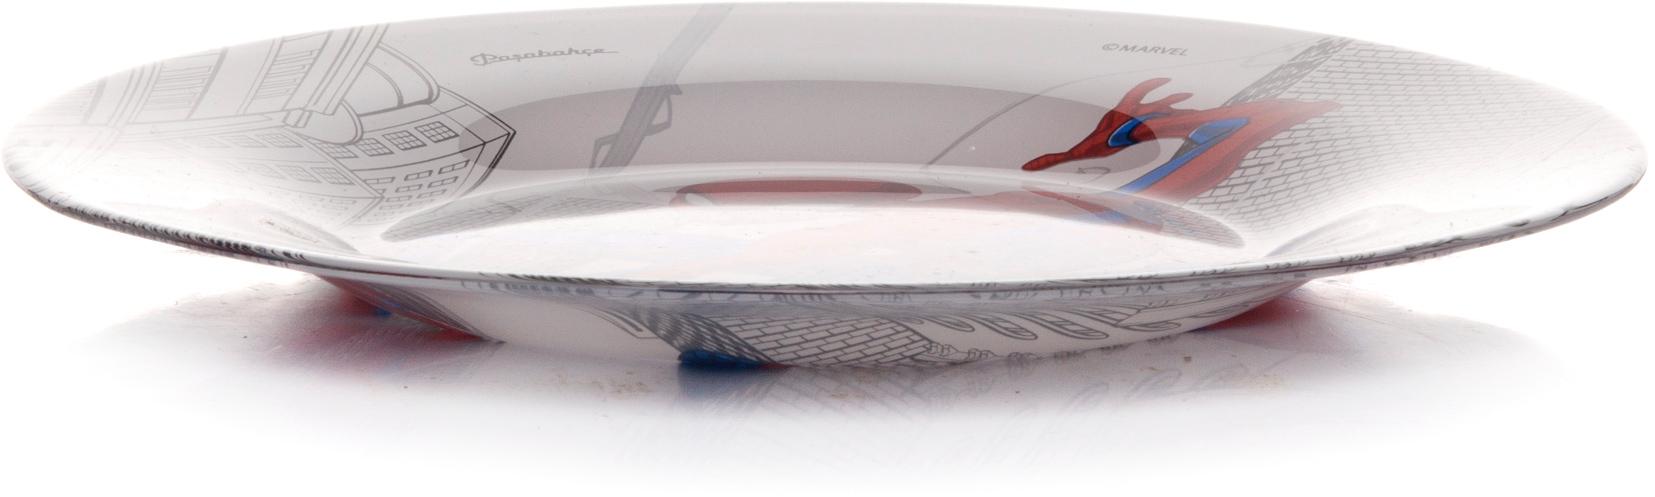 Тарелка Pasabahce Человек-Паук, цвет: серый, диаметр 19,5 см. 10327SLBD4910327SLBD49Тарелка упроч.детская с рис. ЧЕЛОВЕК-ПАУК d=195 мм